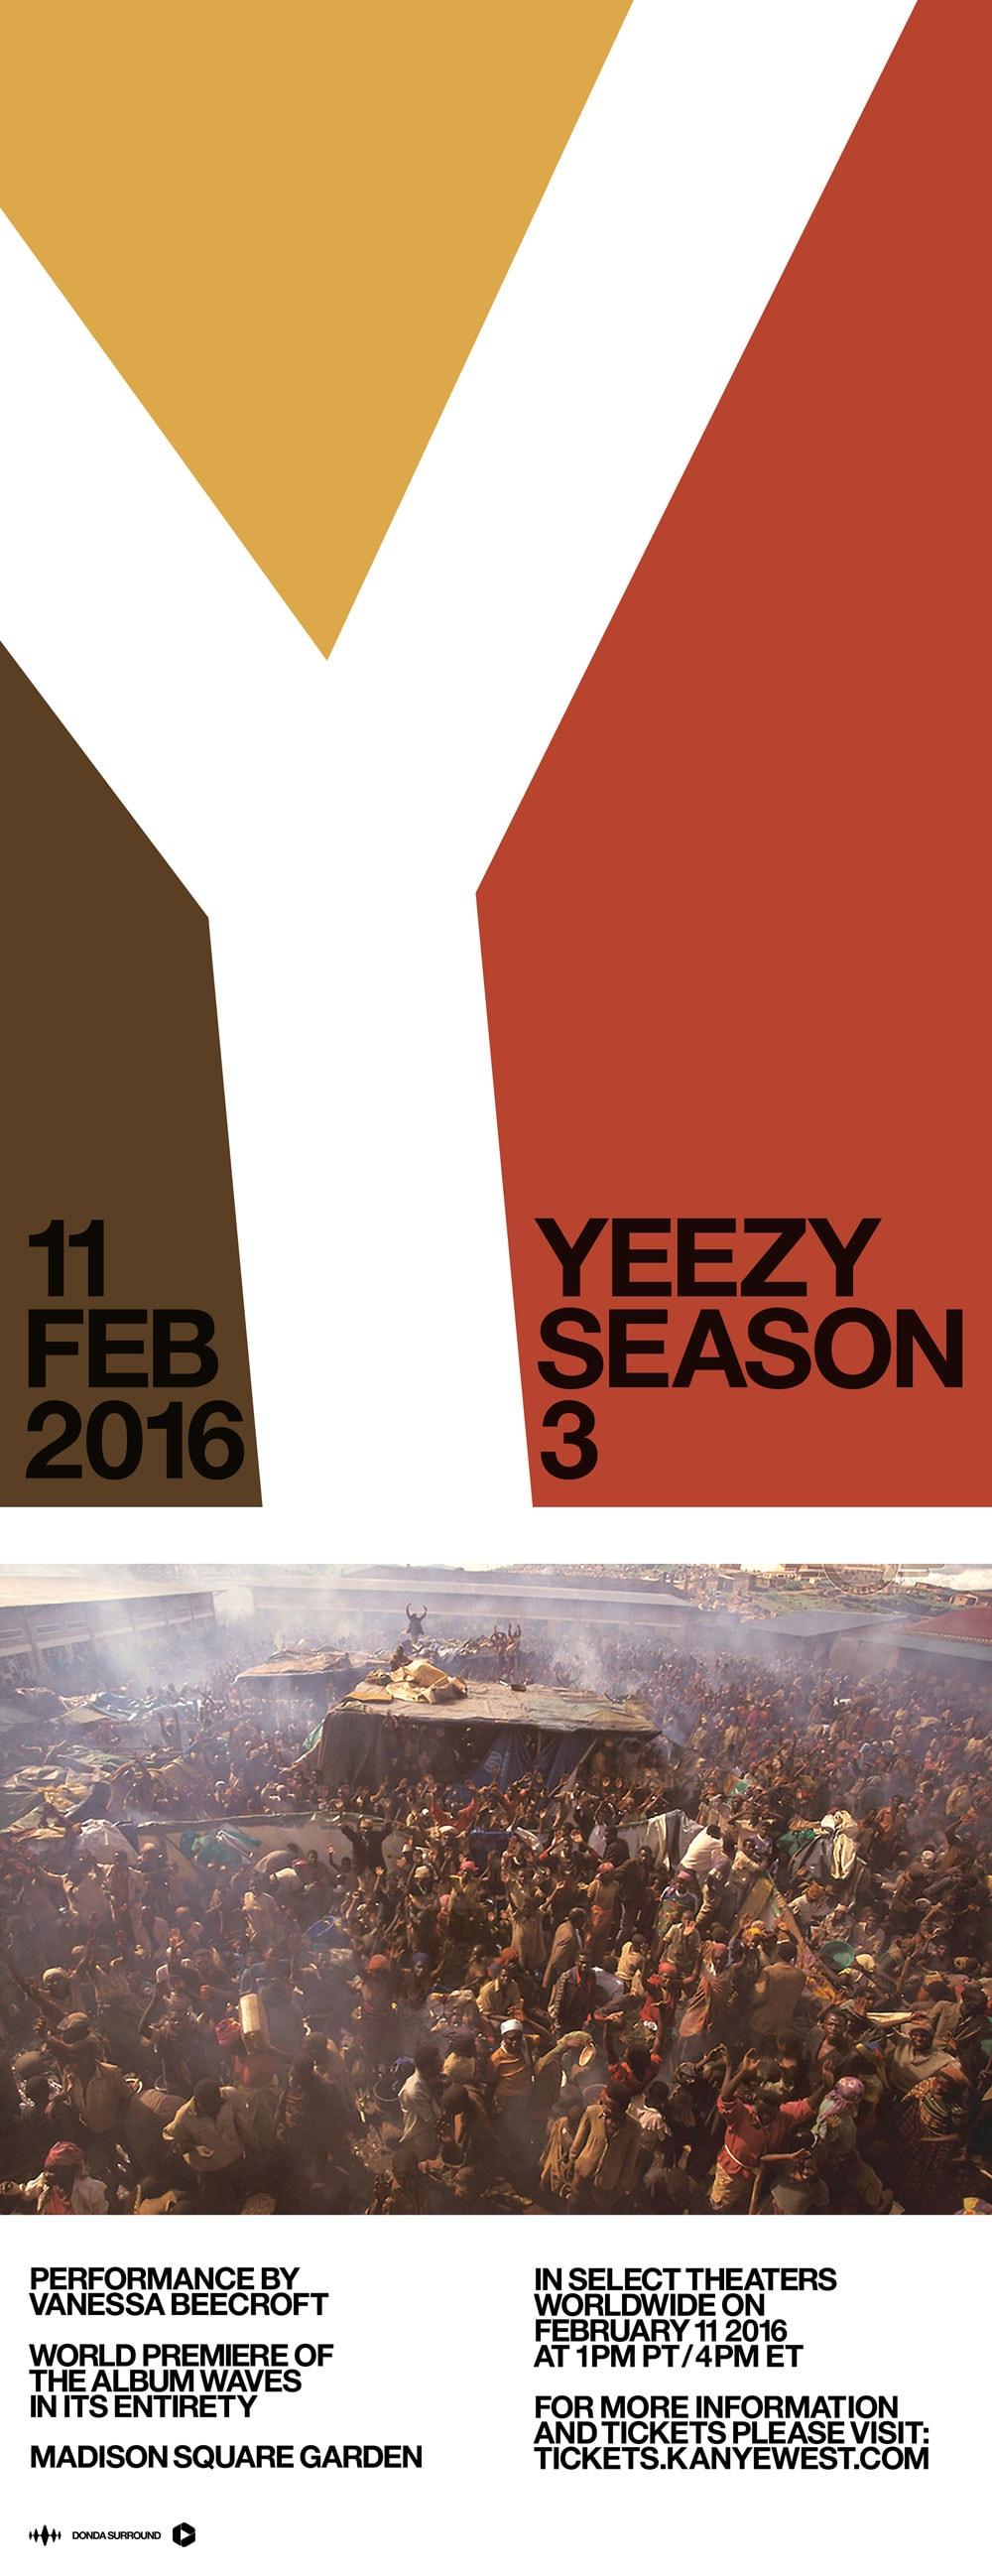 kanye-west-swish-yeezy-season-3-madison-square-garden